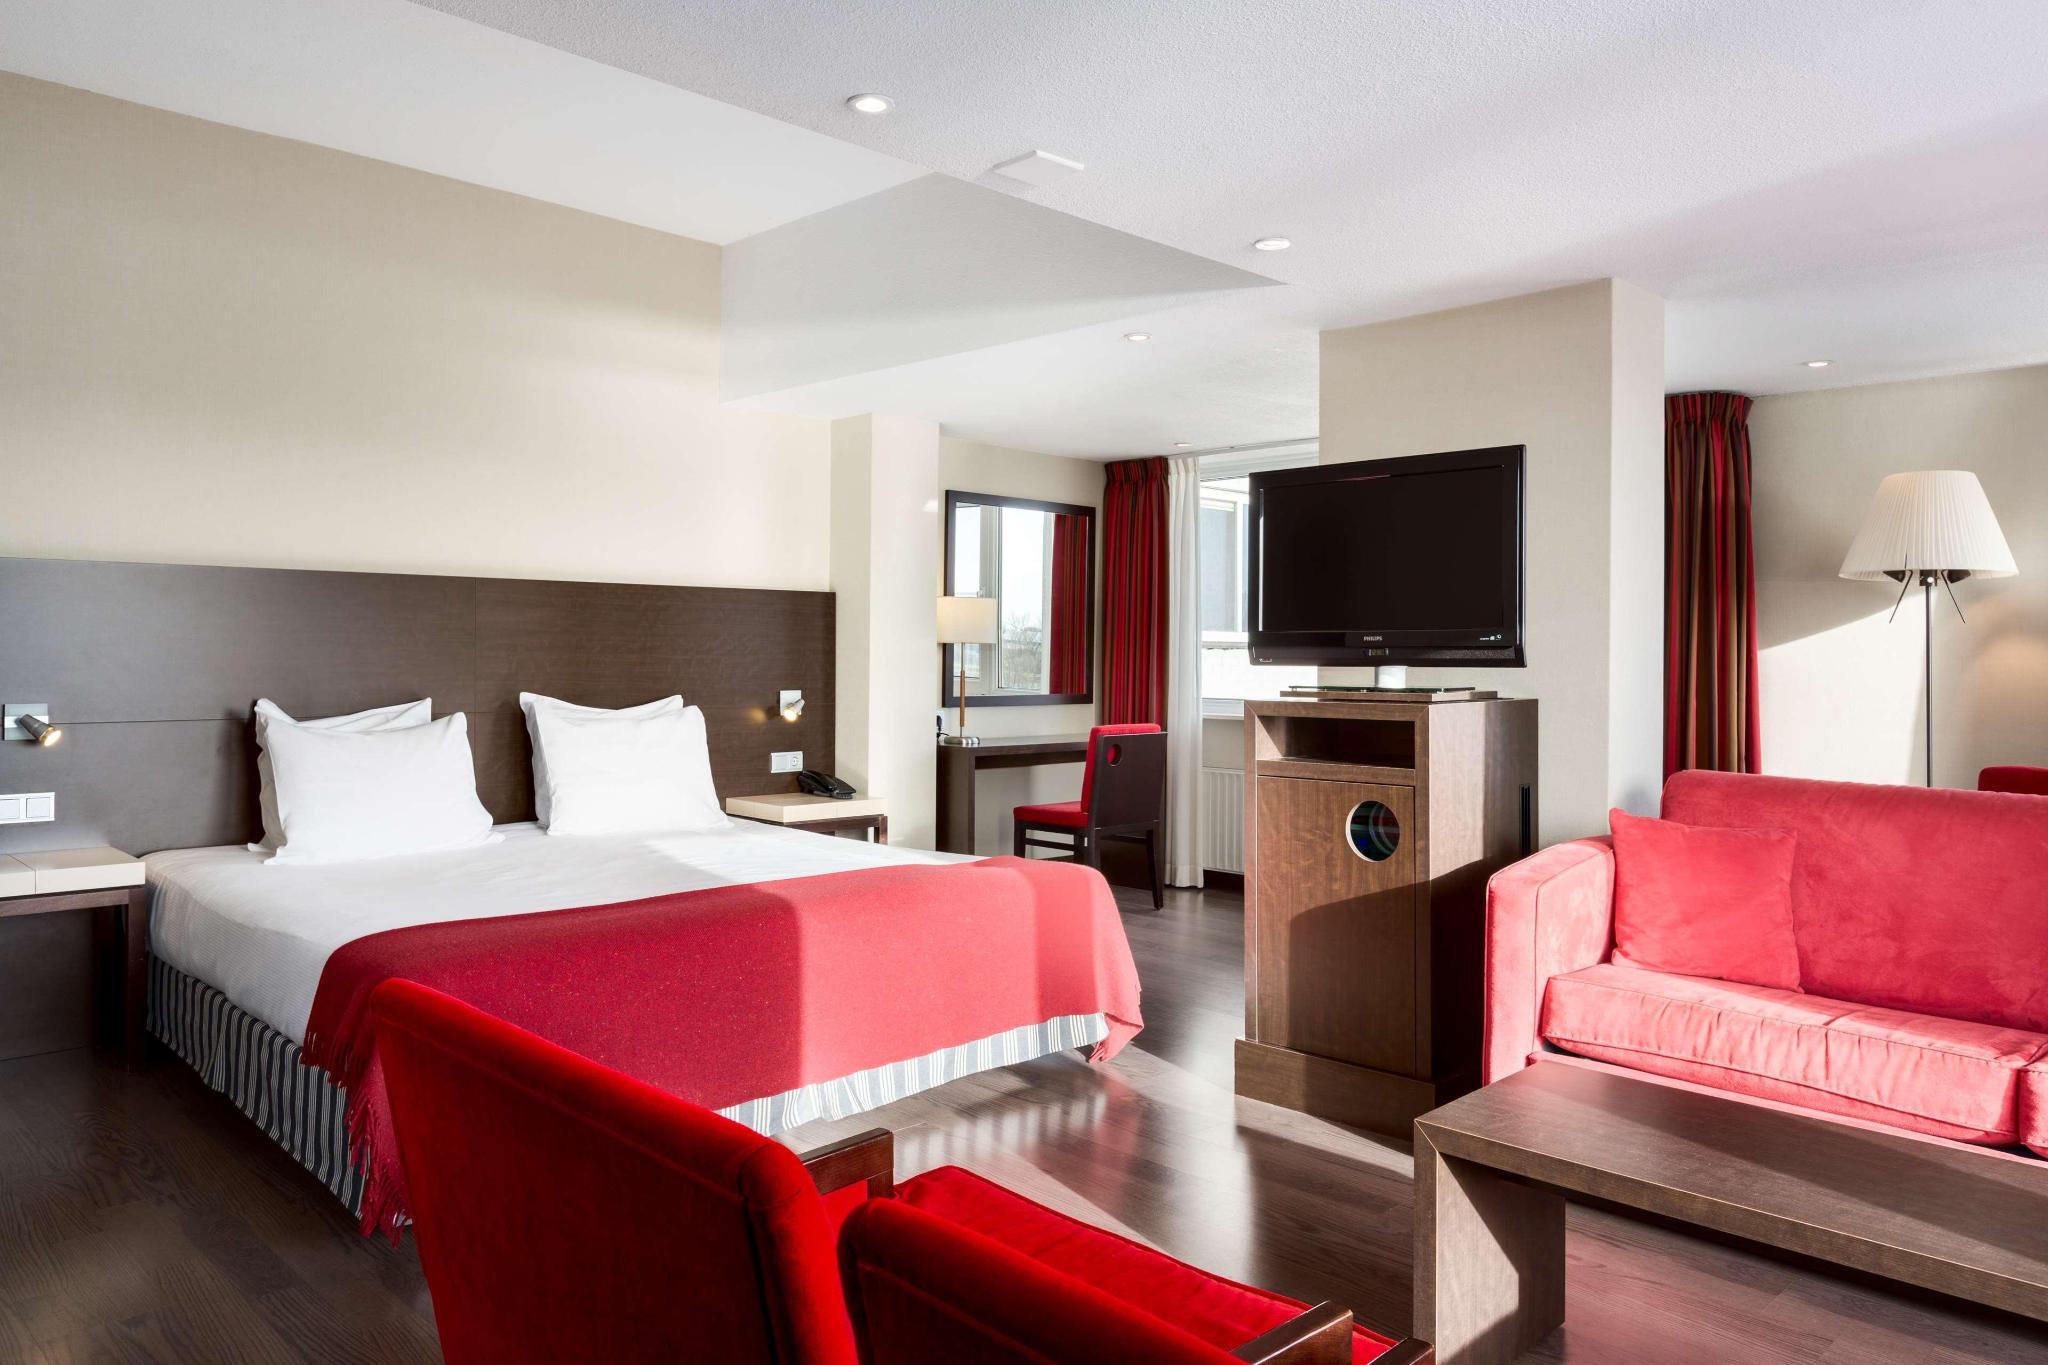 Junior suite with views